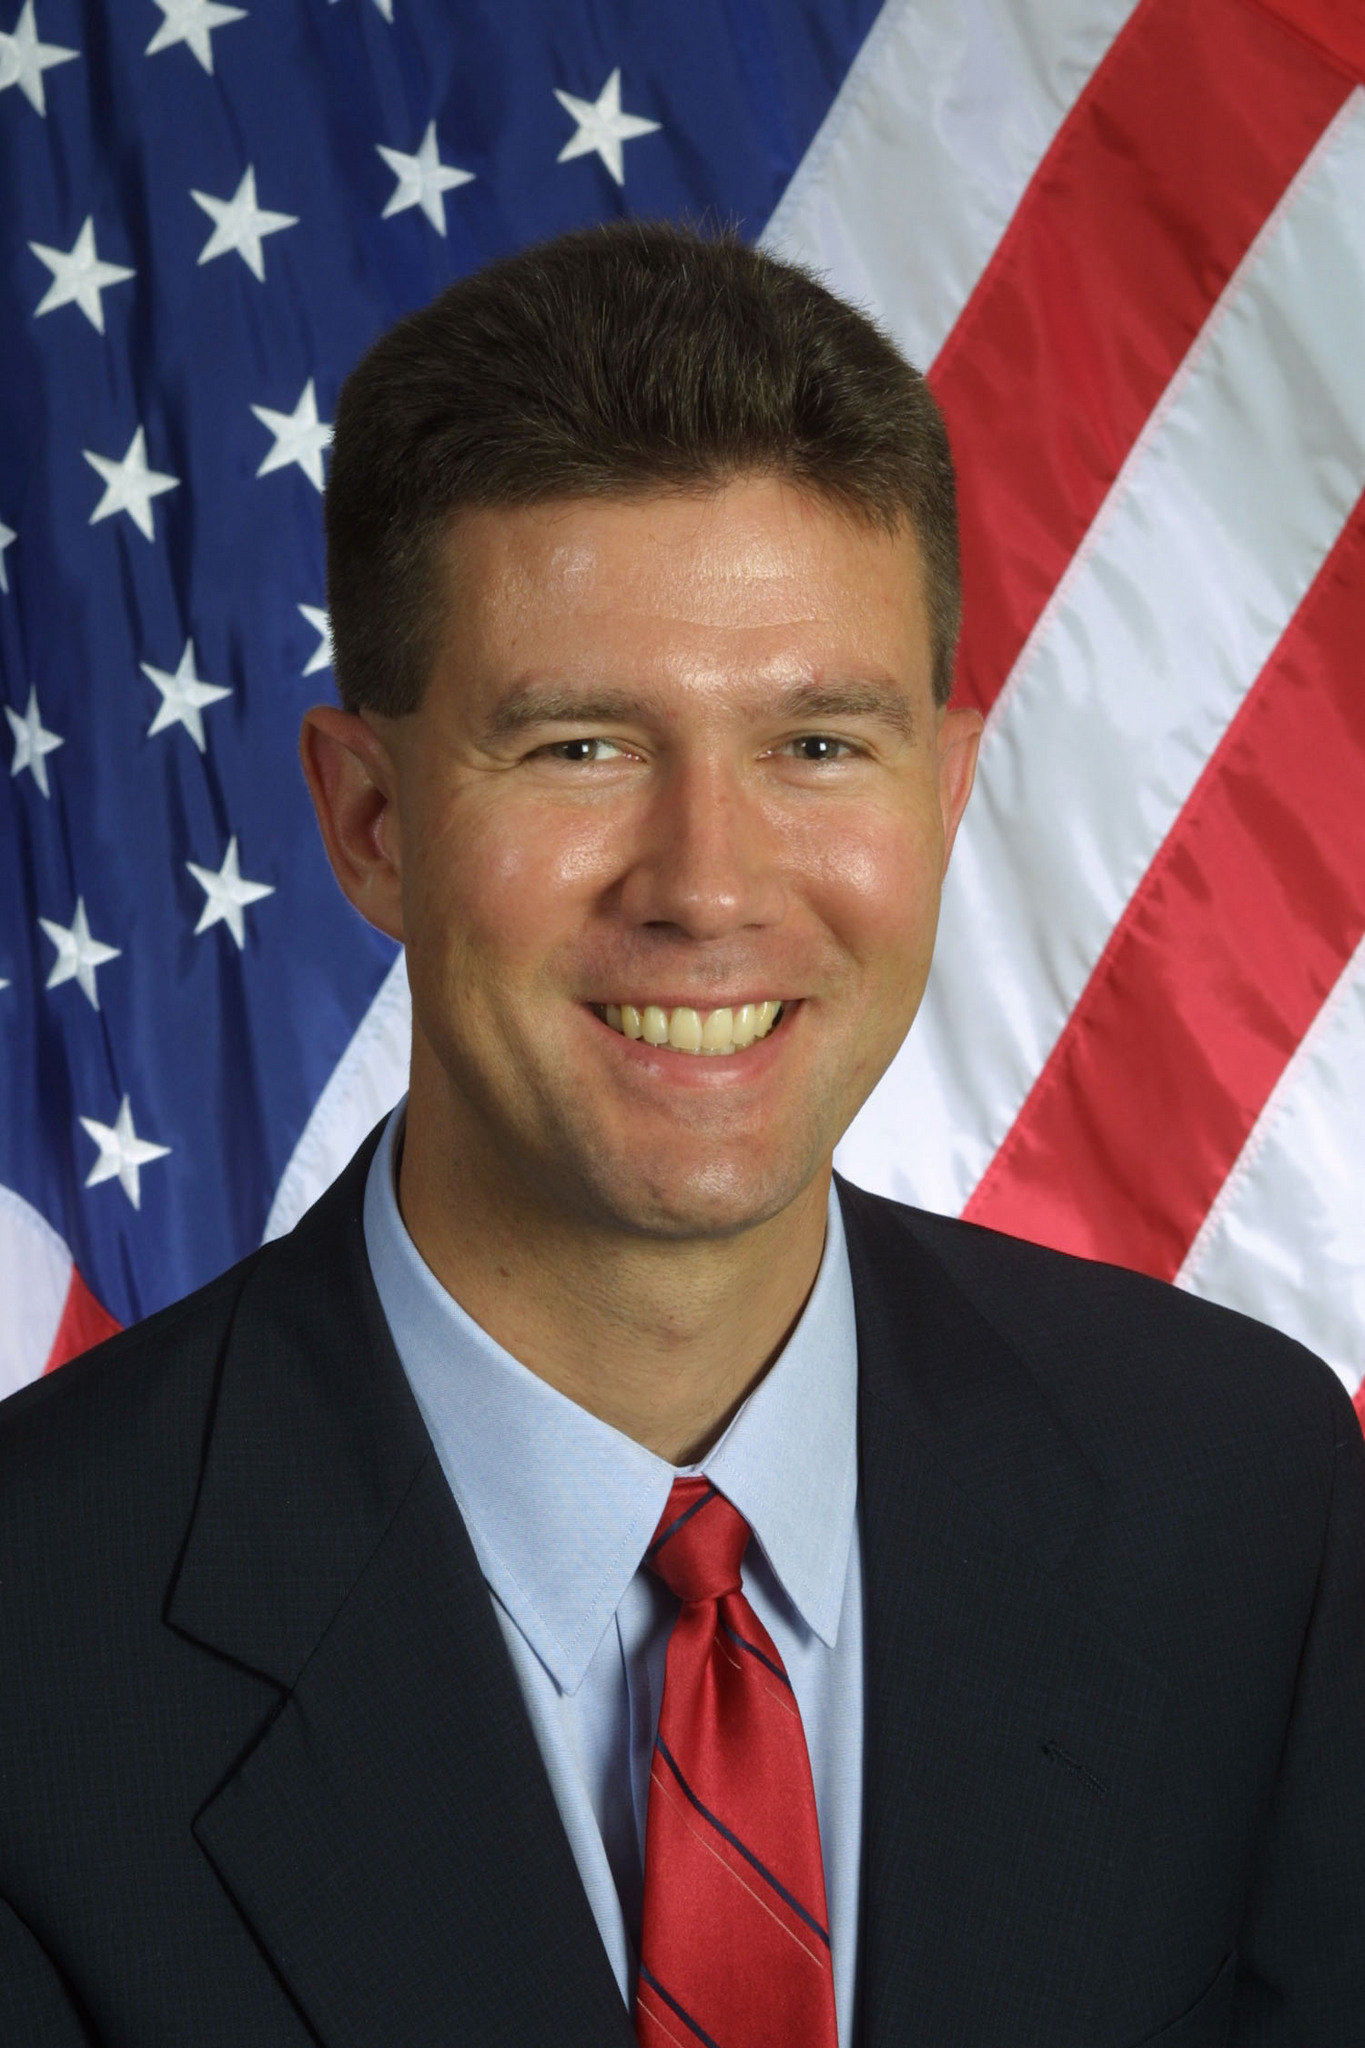 Secretary Merrill co-authors 'Alabama: The Bicentennial' history book